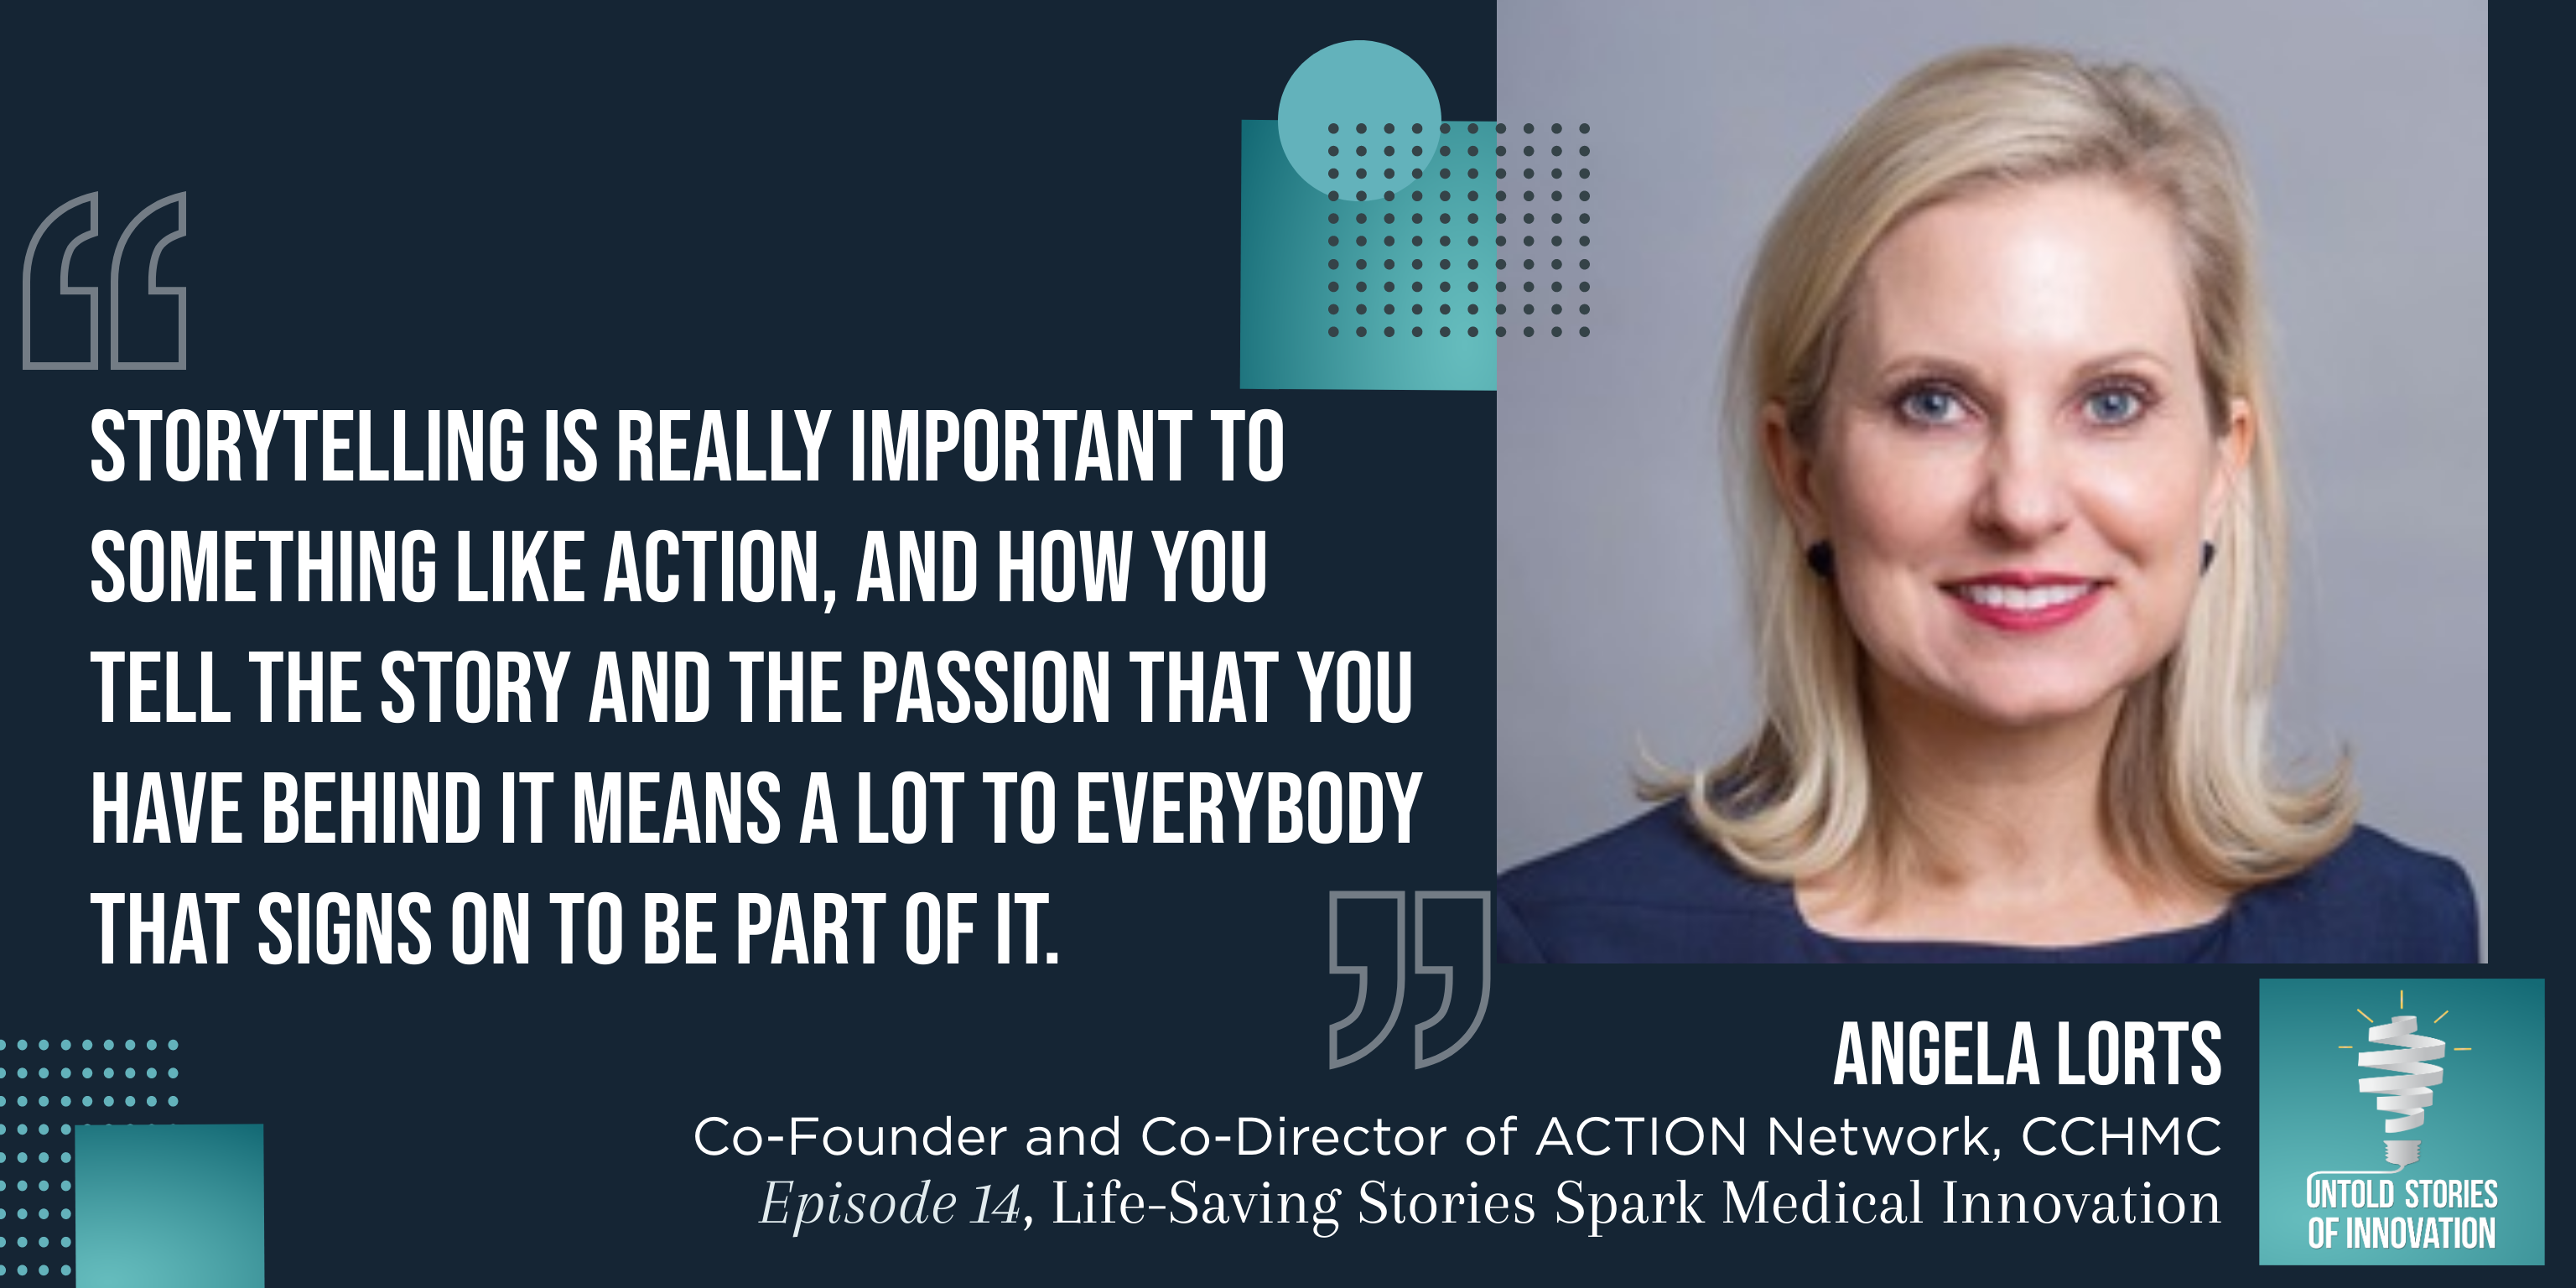 Angela Lorts Quote